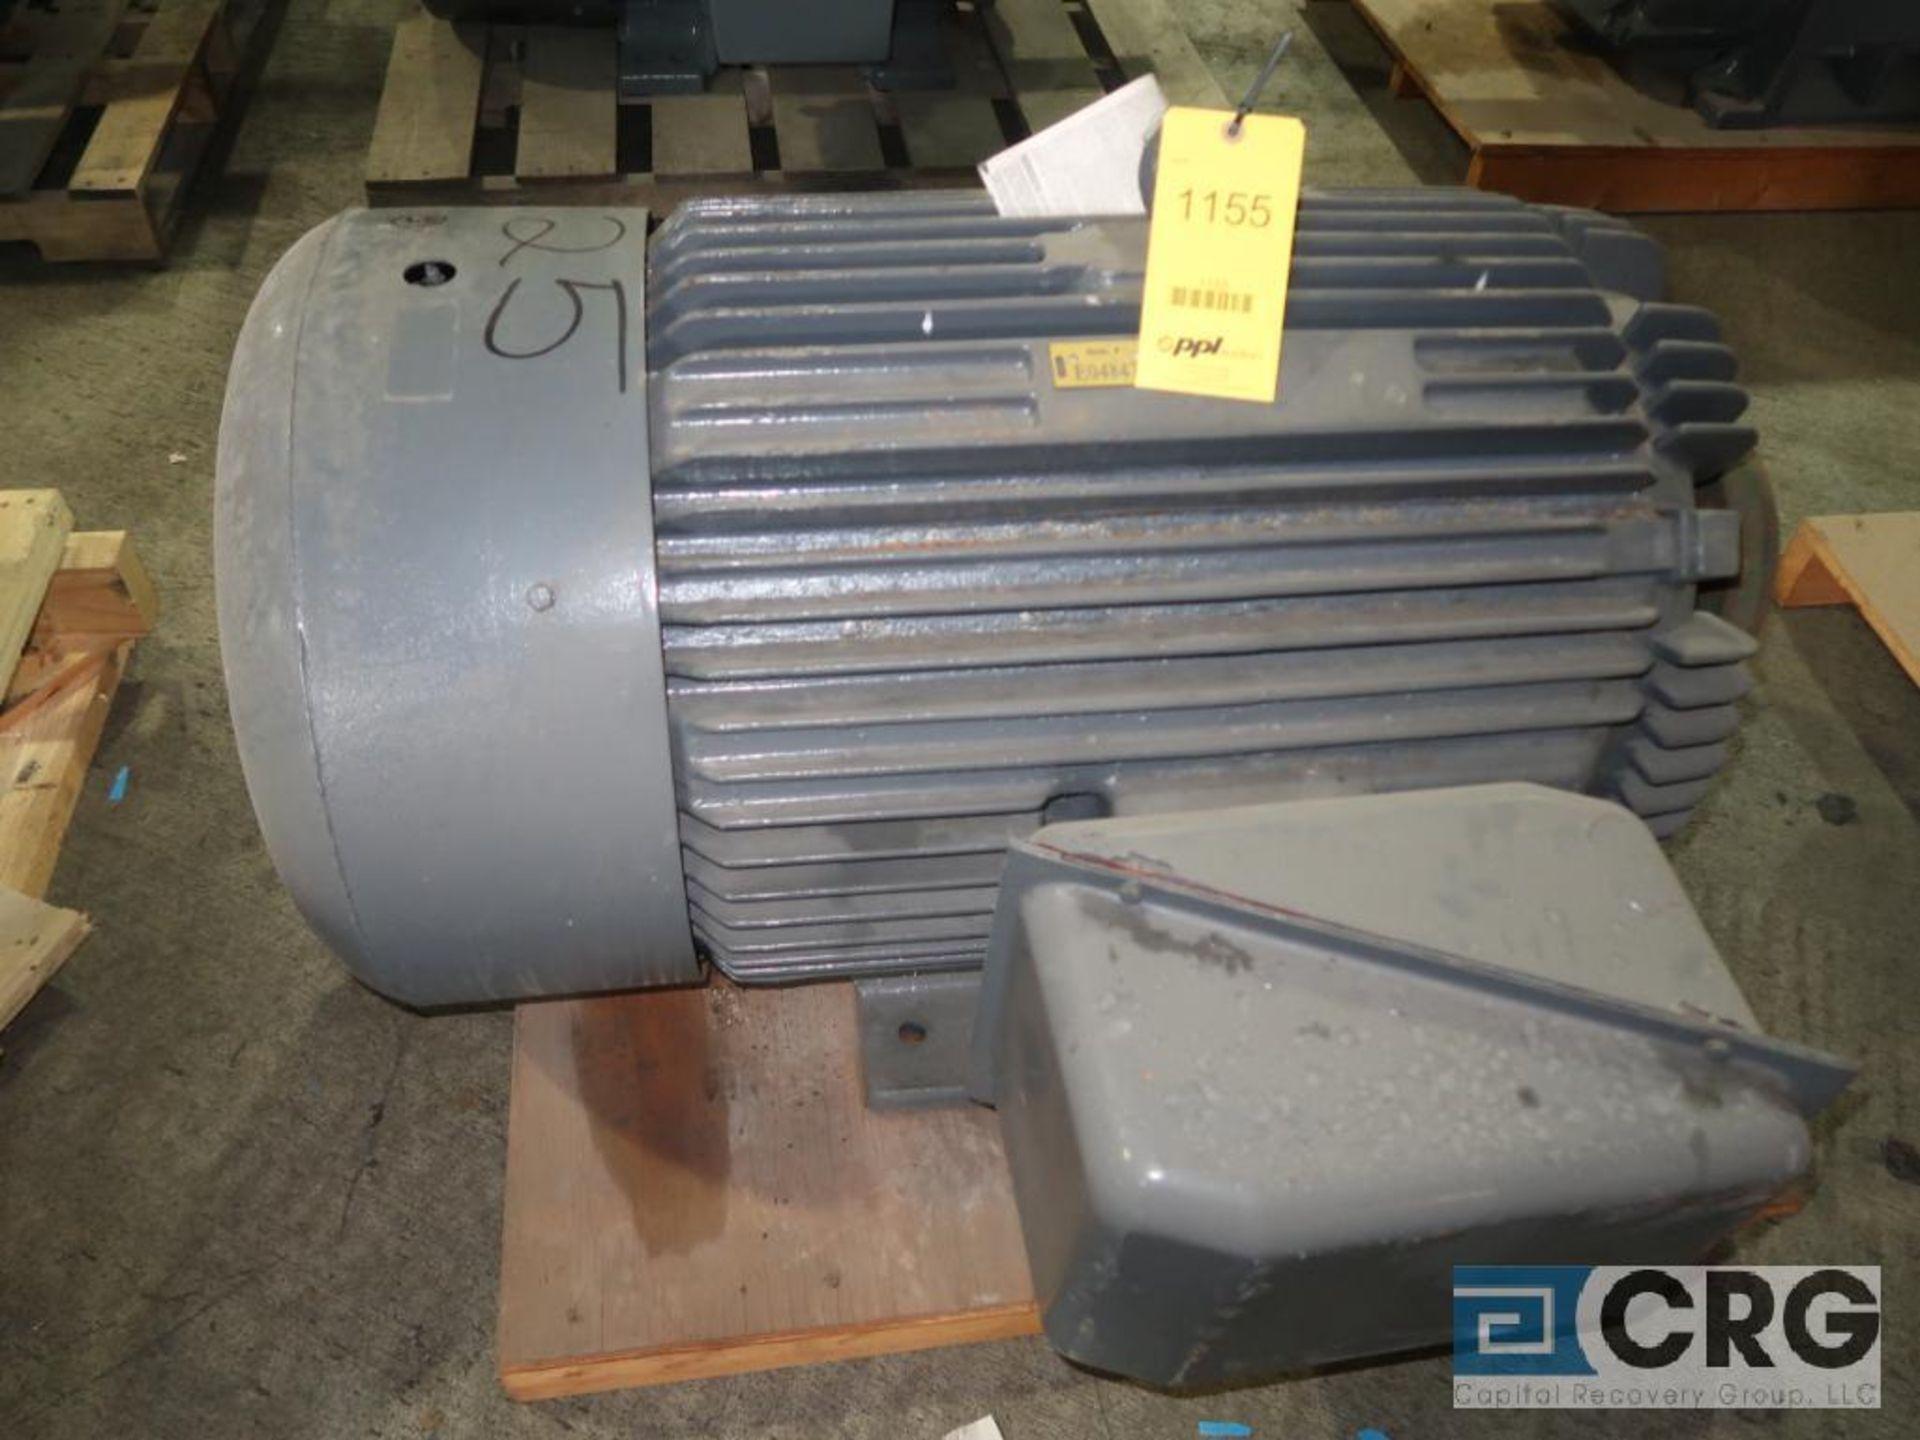 Toshiba electric motor, 125 HP, 1,770 RPMs, 230/460 volt, 3 ph., 444T frame (Finish Building)